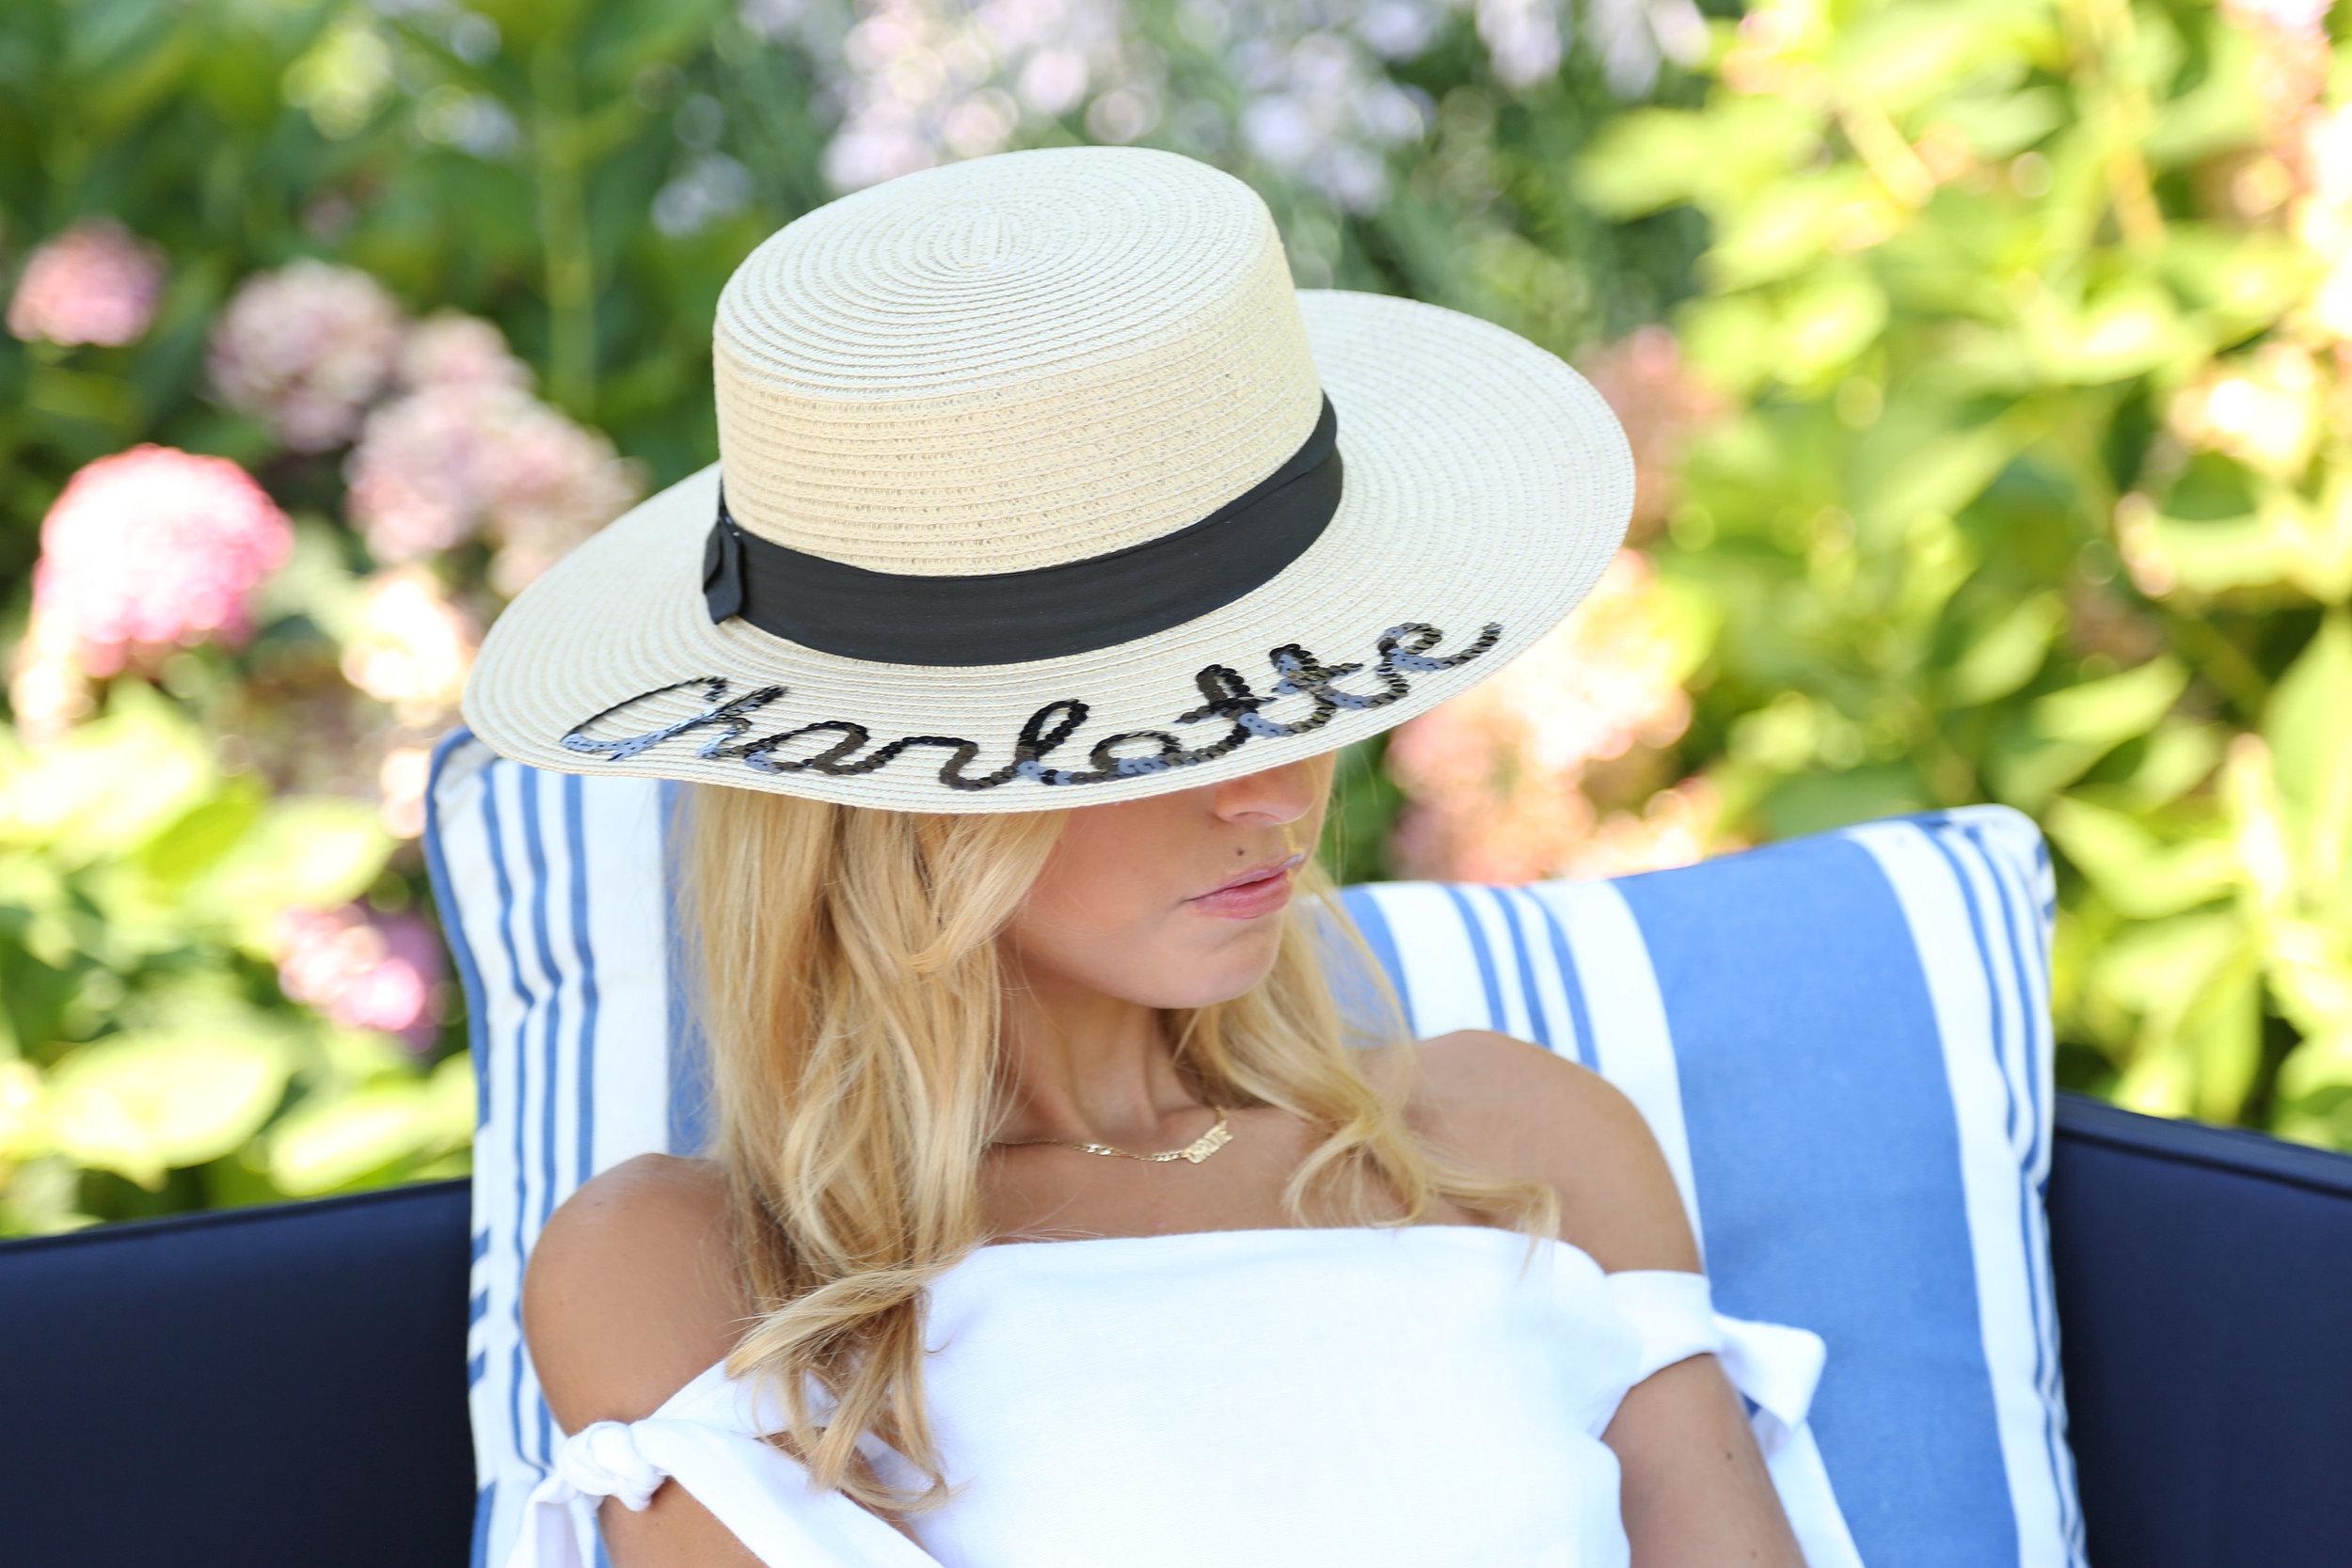 CHARLOTTE BICKLEY YIN 2MY YANG SISTER BLOGGERS STRAW HATS